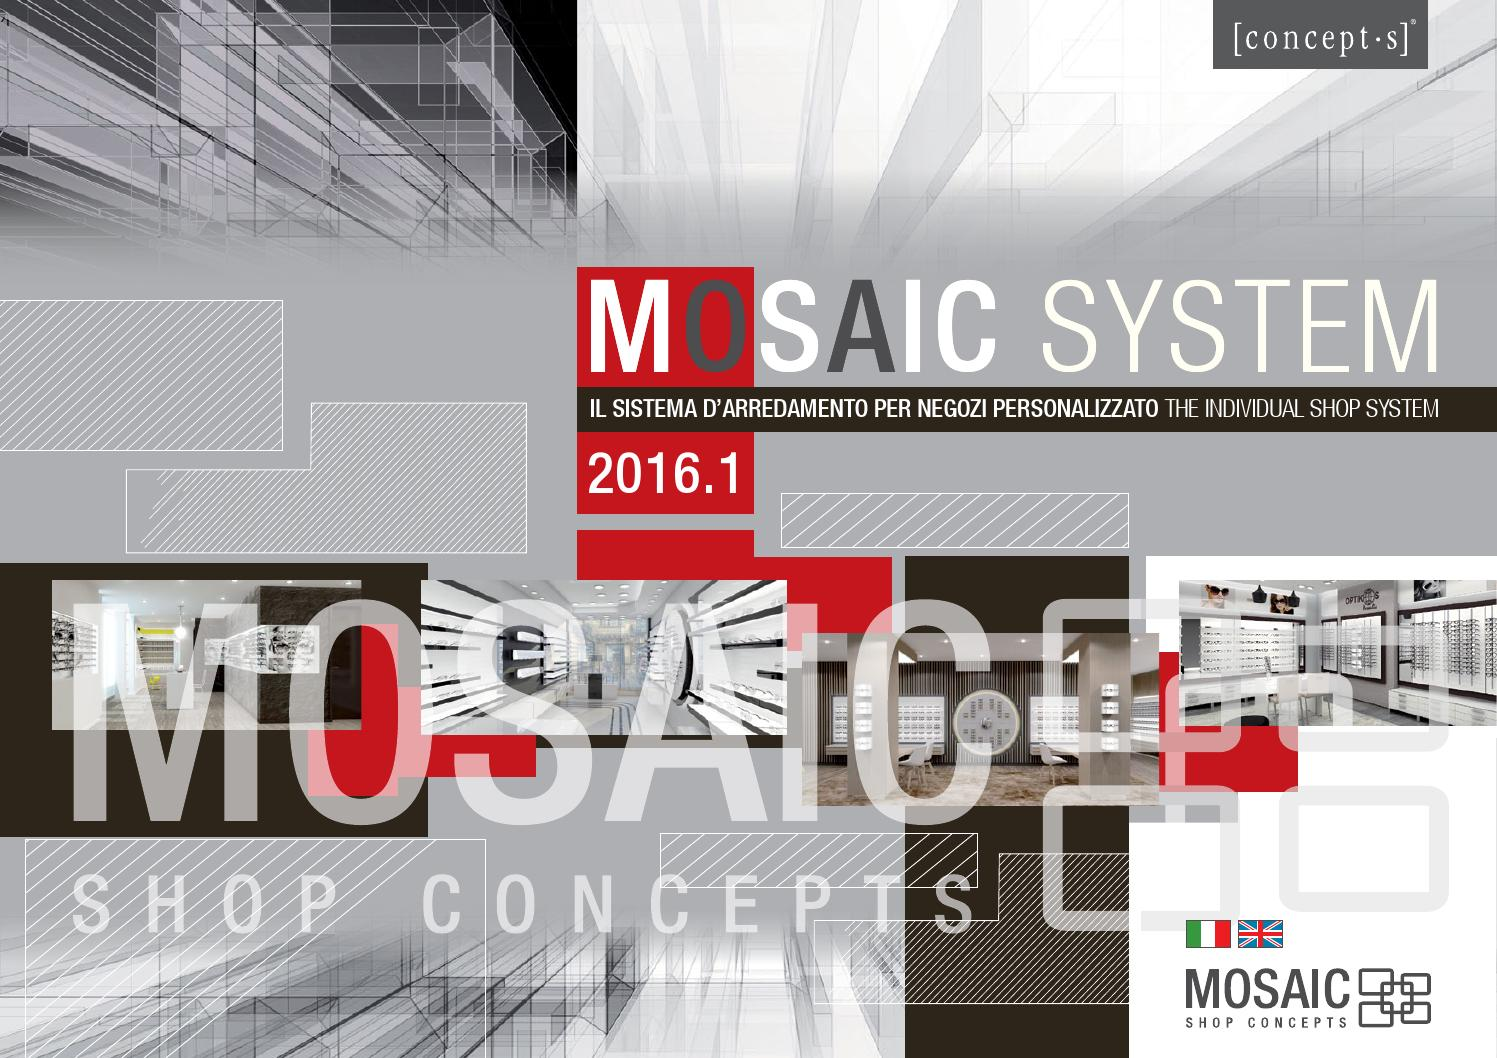 mosaic system il sistema d arredamento per negozi